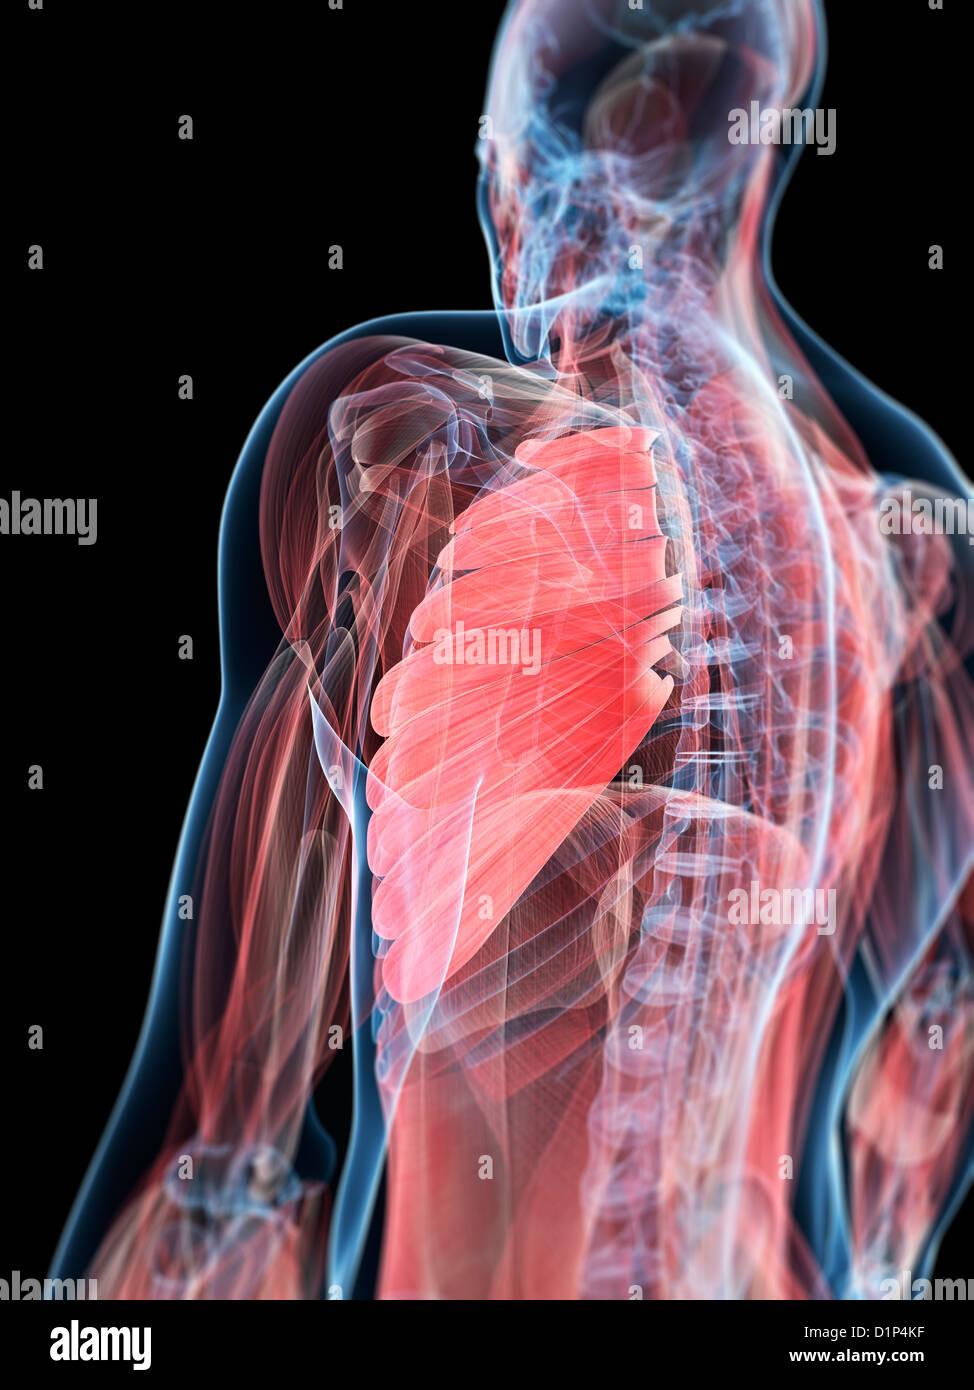 Brustmuskel, artwork Stockfoto, Bild: 52732387 - Alamy